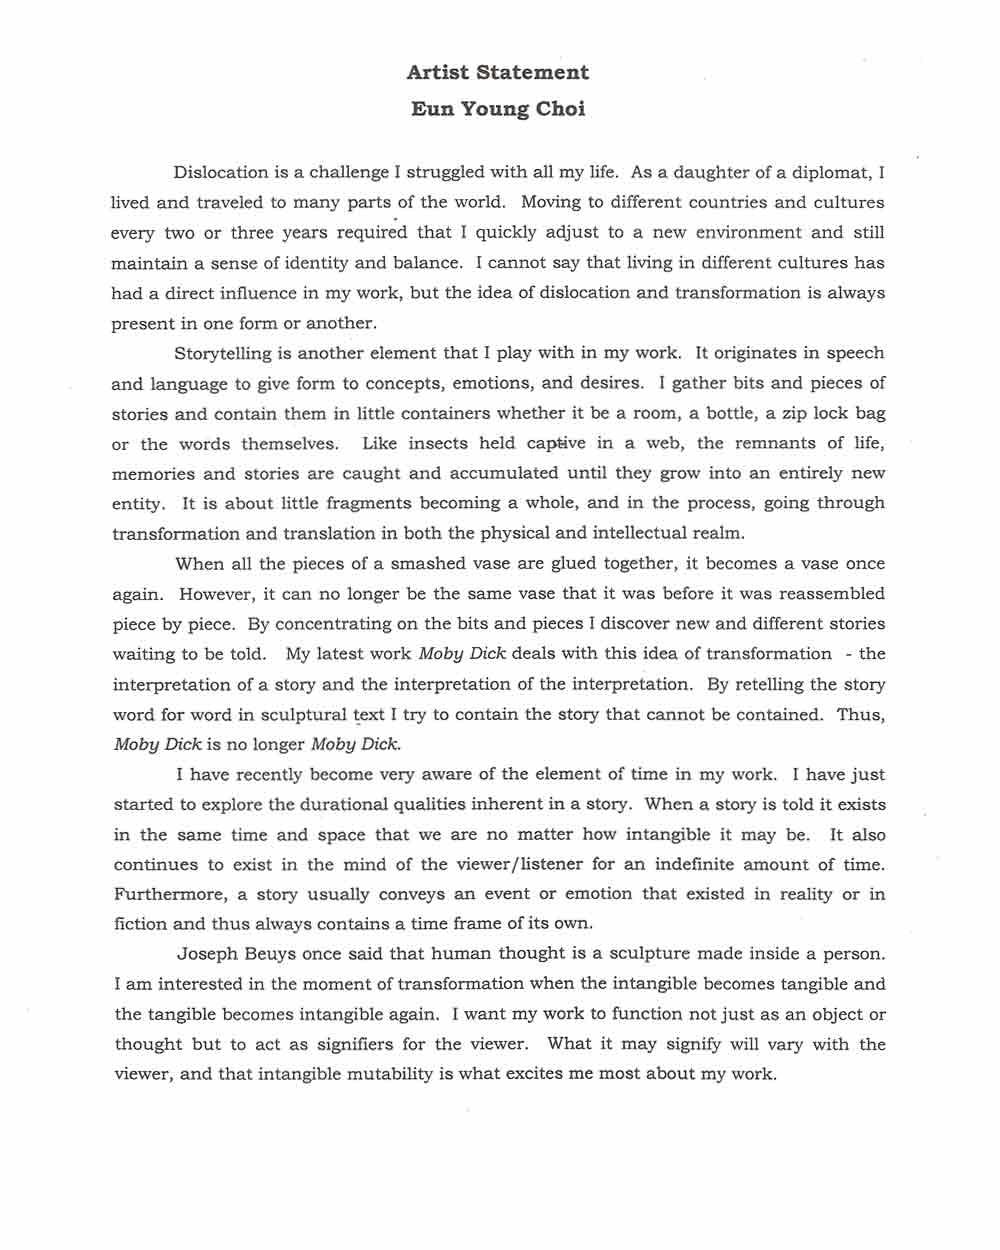 Eun Young Choi's artist statement. Source: Document